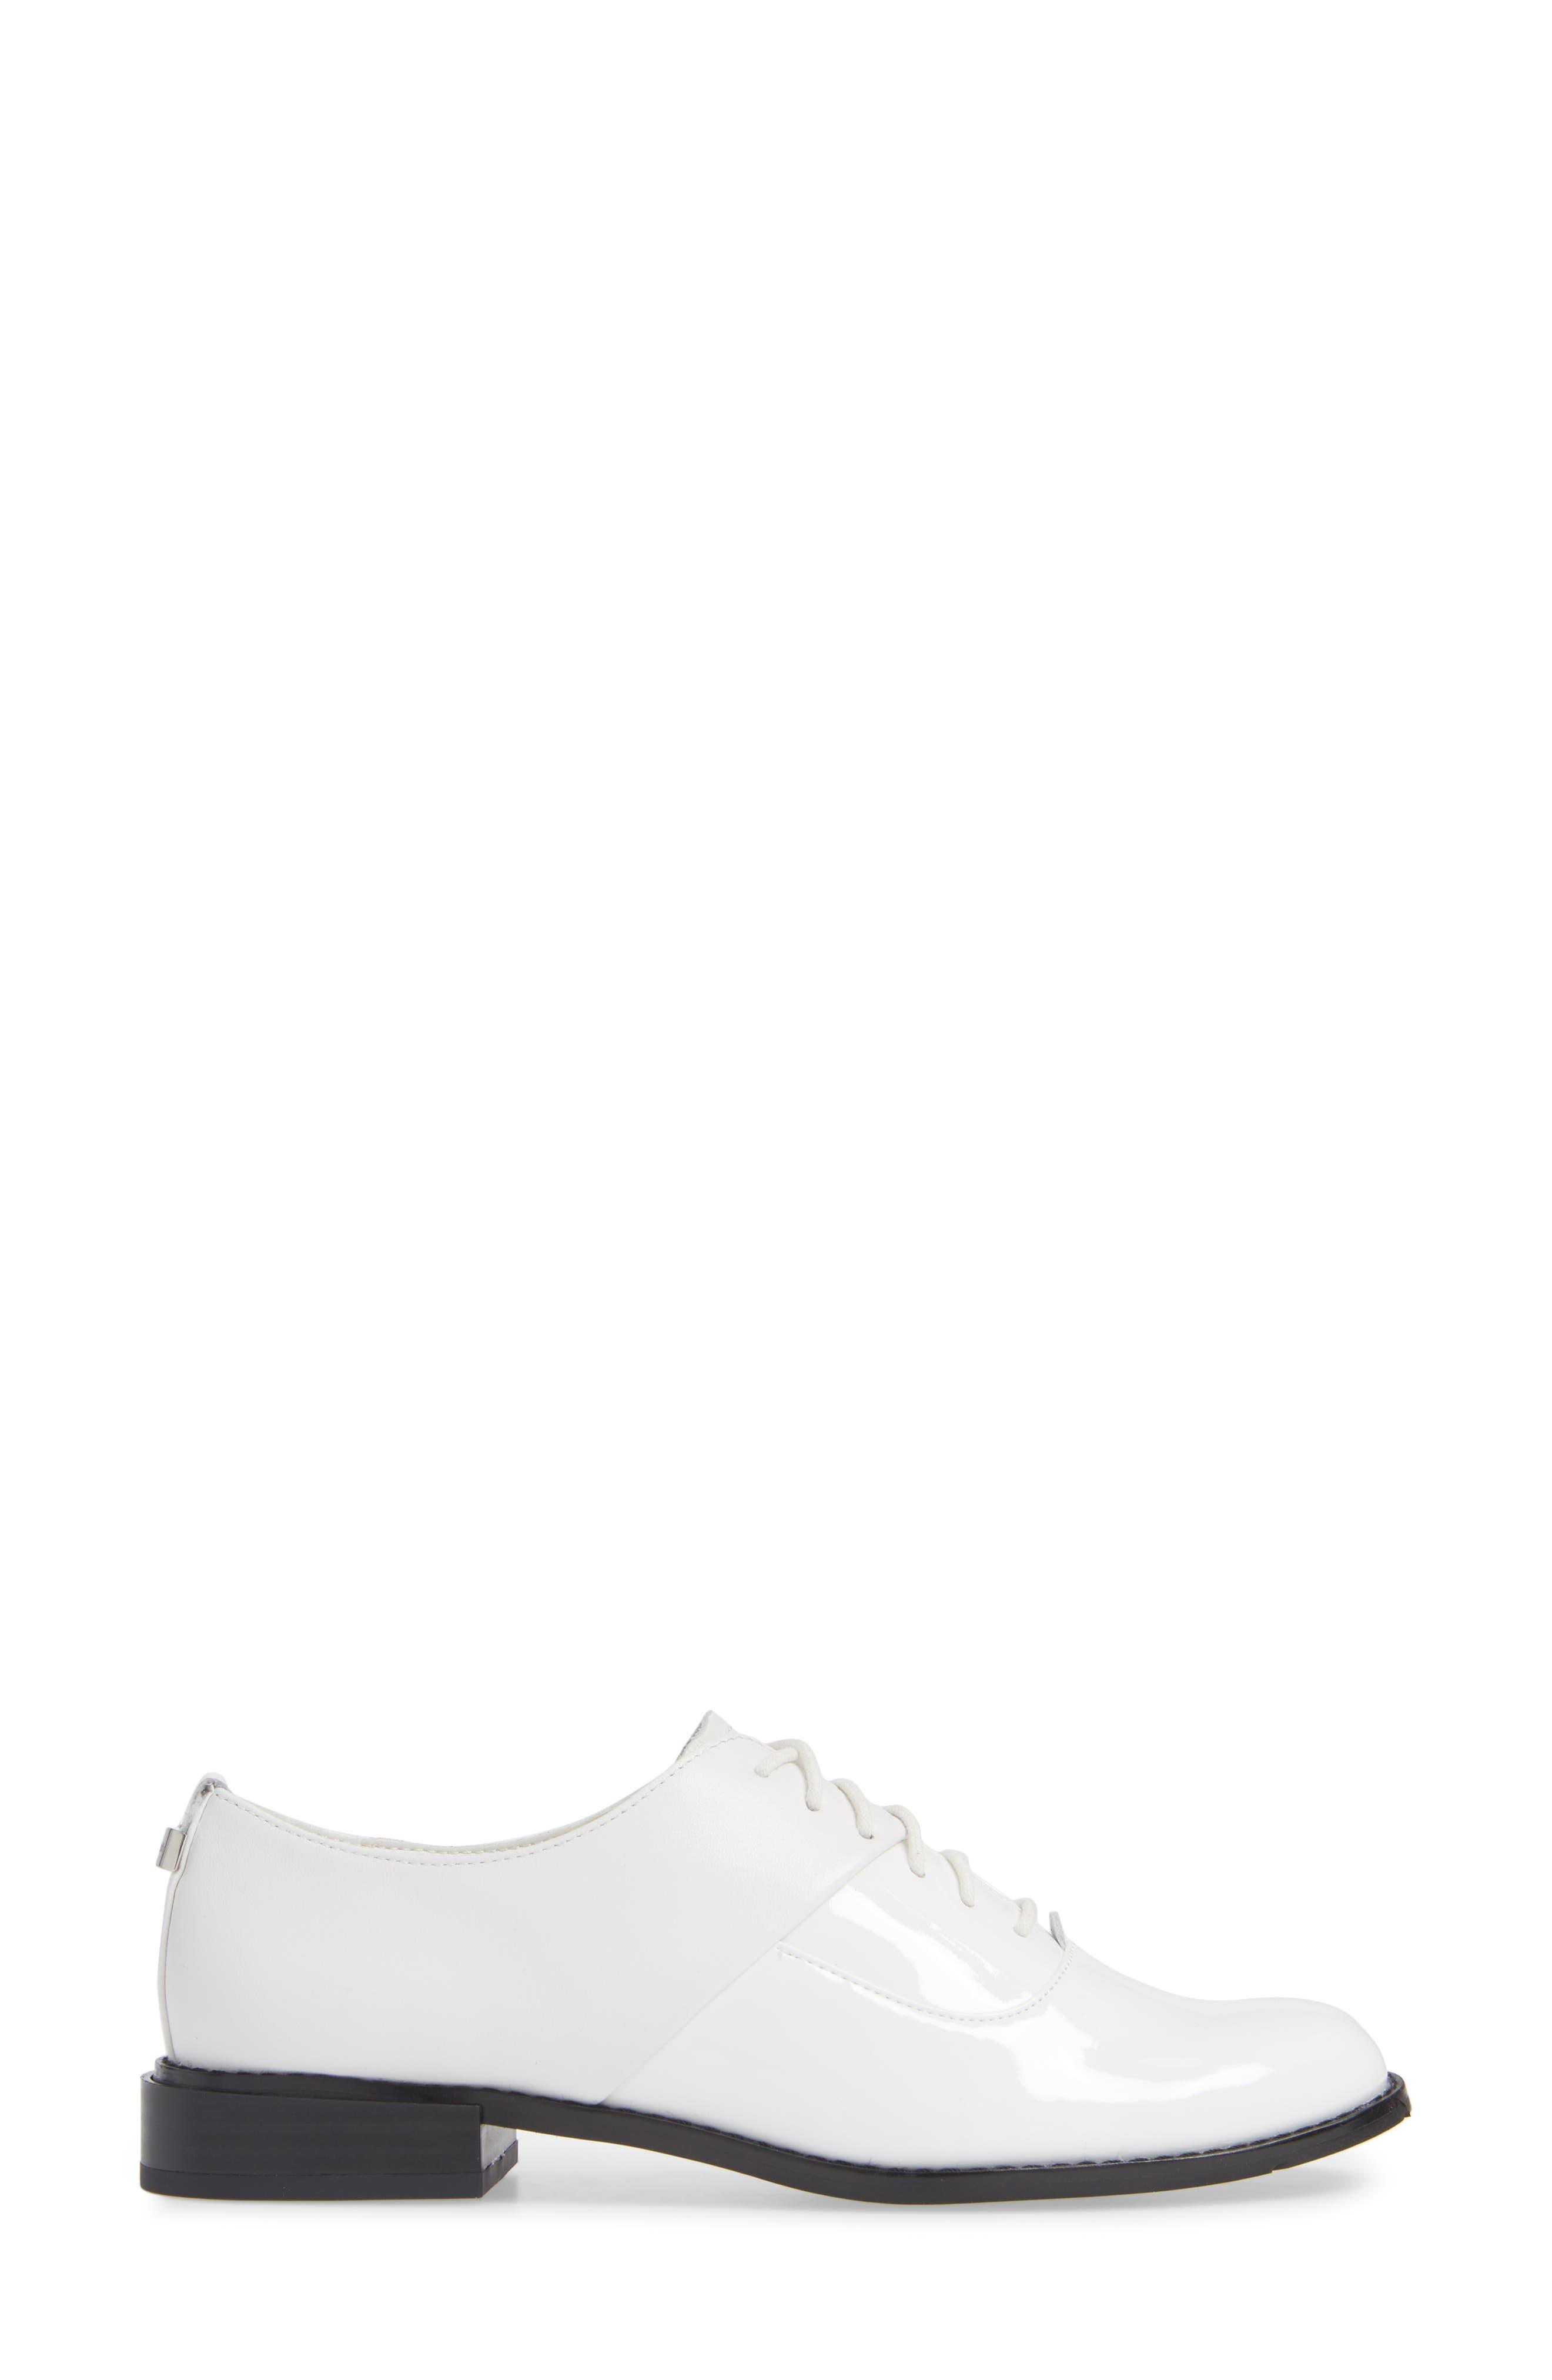 Aracely Oxford,                             Alternate thumbnail 3, color,                             PLATINUM WHITE PATENT